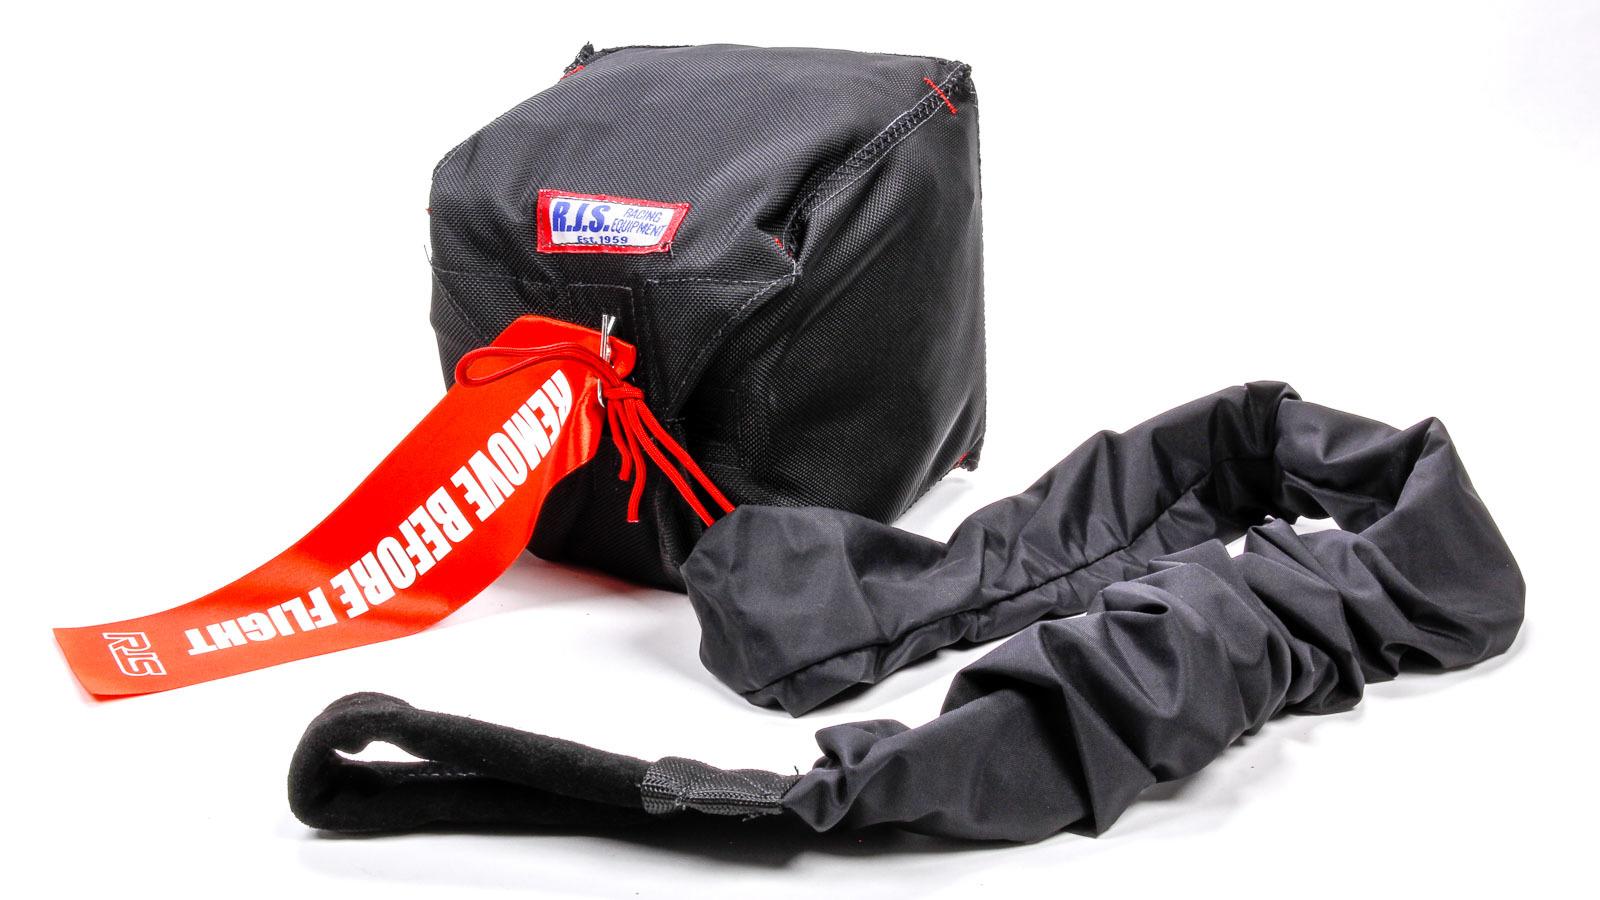 Rjs Safety Sportsman Chute W/ Nylon Bag and Pilot Blue